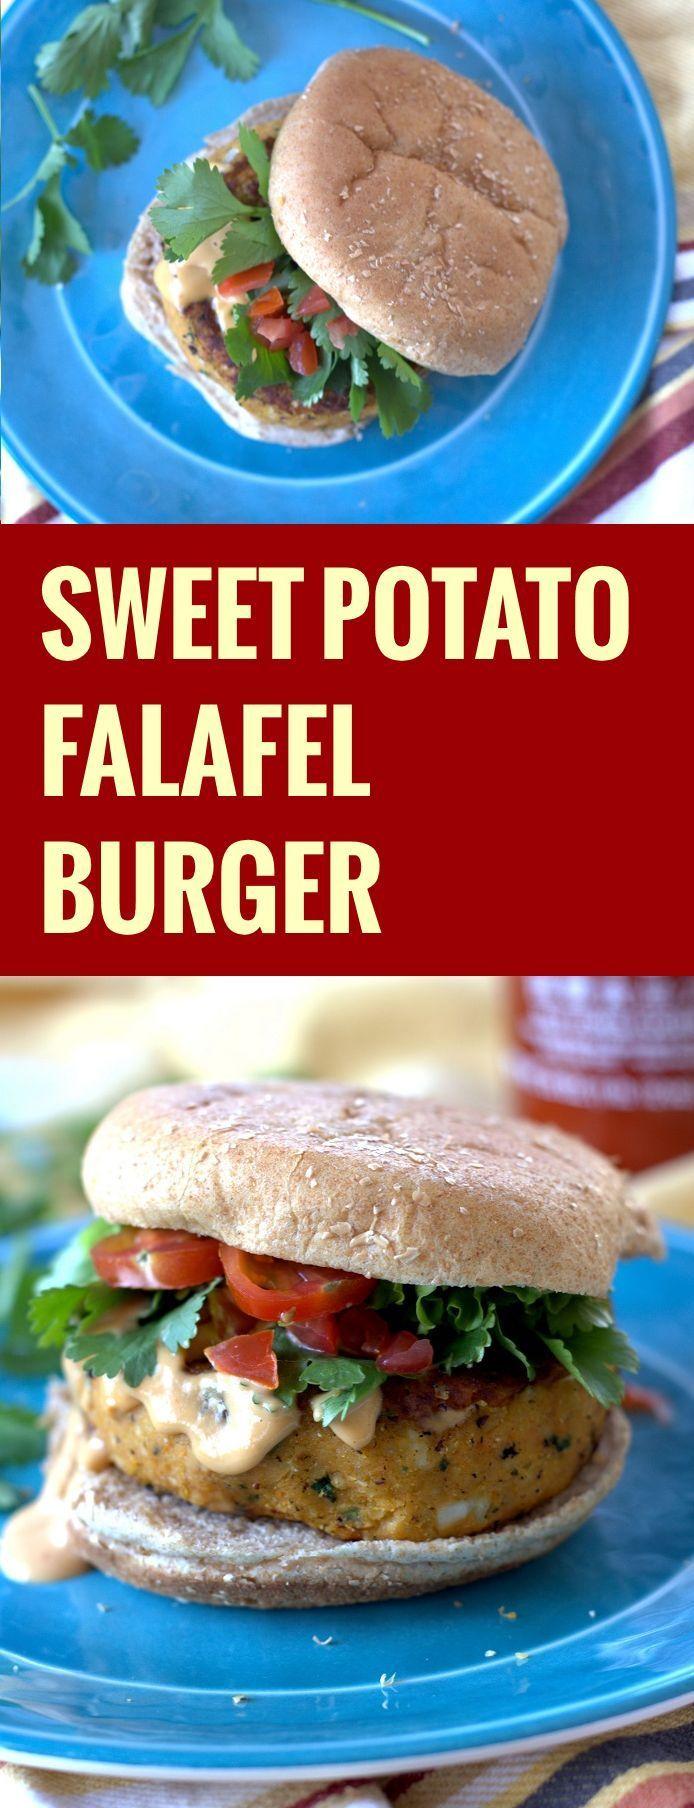 Blue apron falafel - Sweet Potato Falafel Burgers